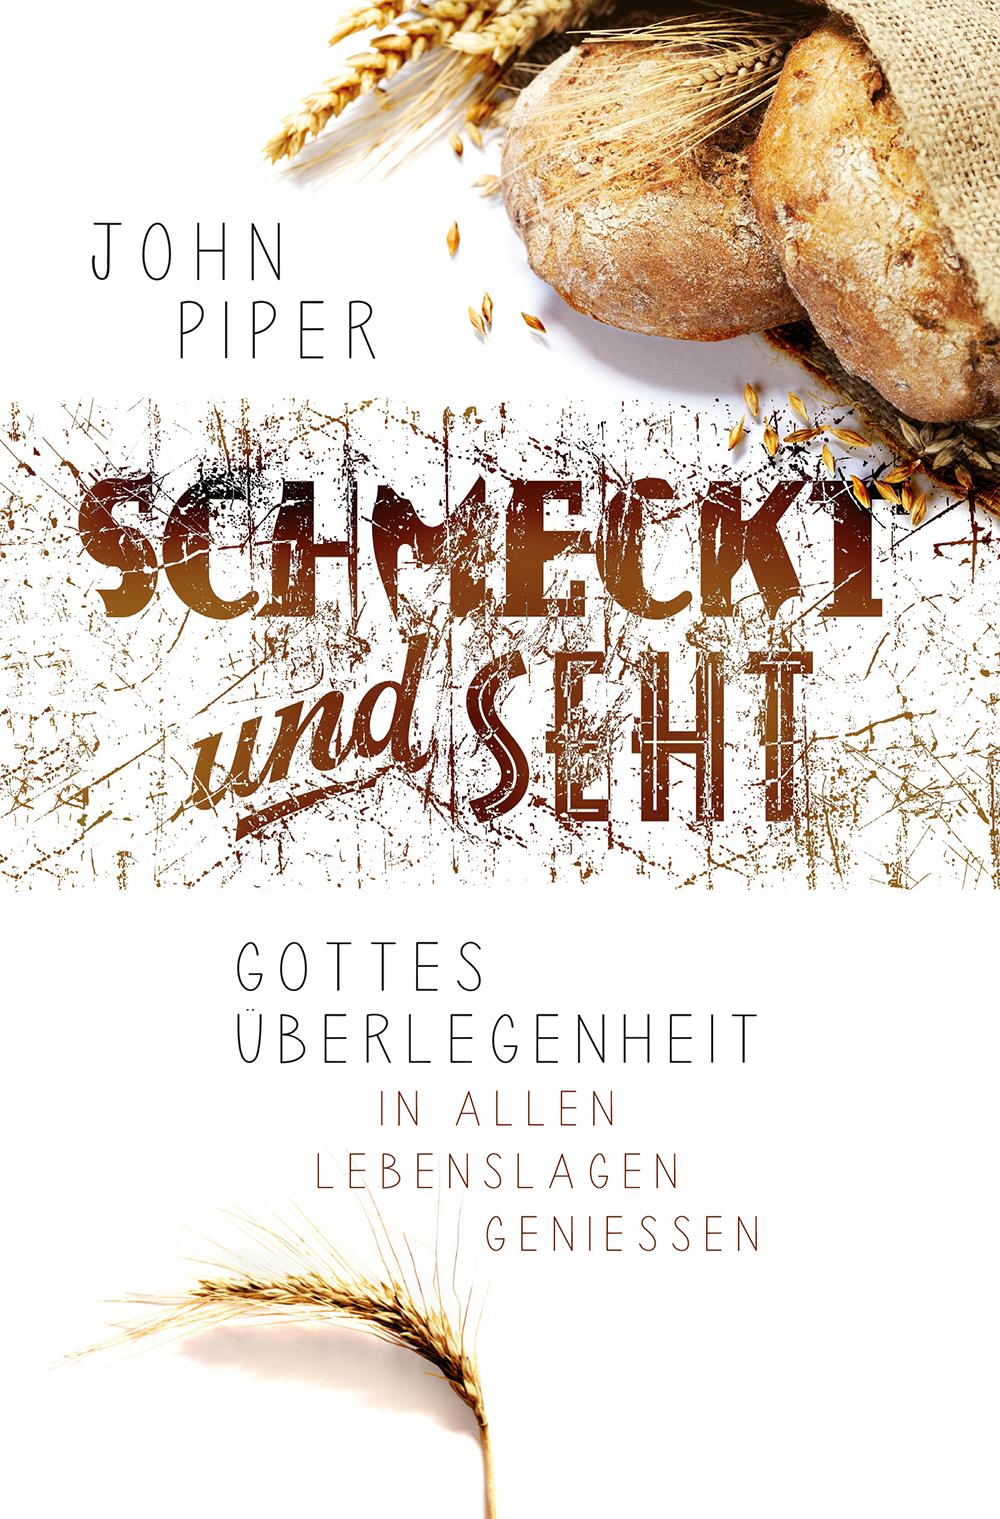 CLV_schmeckt-und-seht_john-piper_256309_1